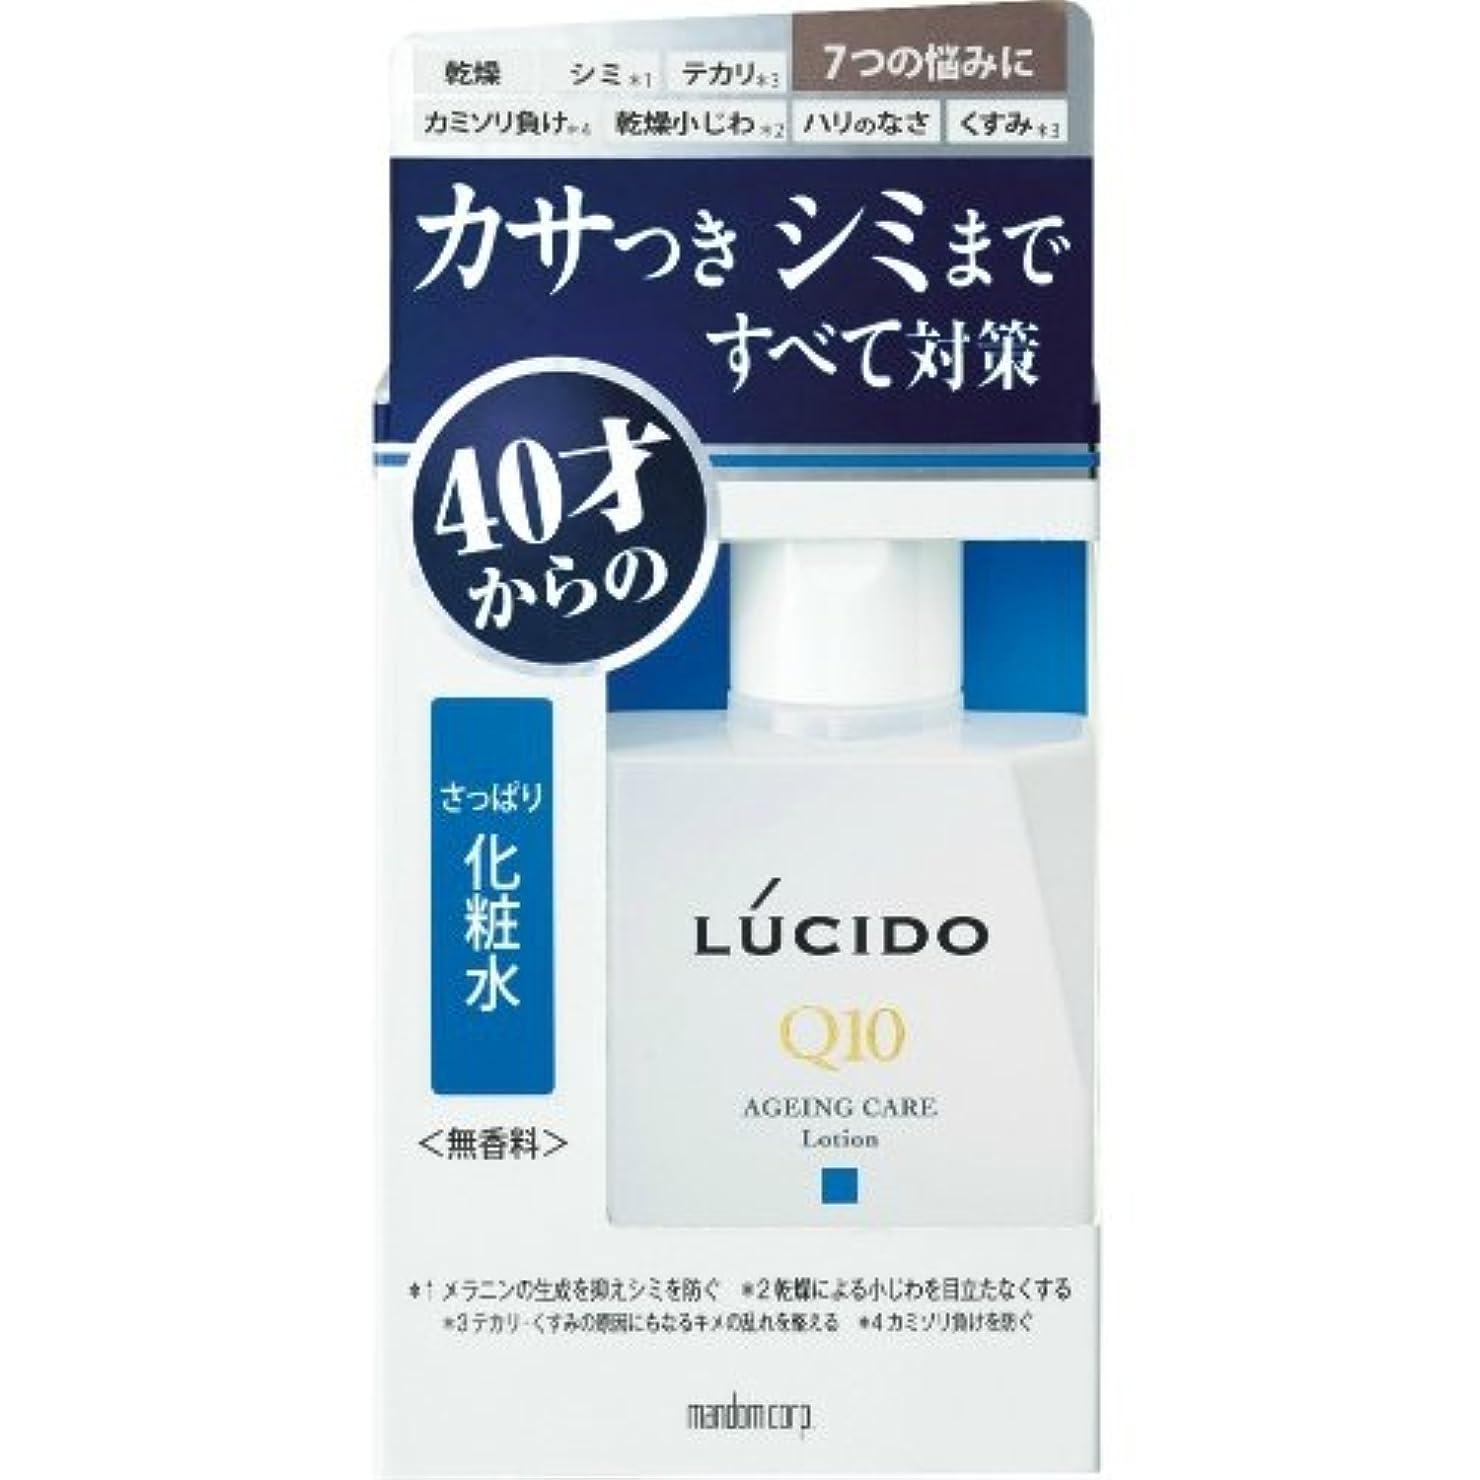 MANDOM マンダム ルシード 薬用トータルケア さっぱり化粧水 無香料 110ml ×10点セット(4902806107296)